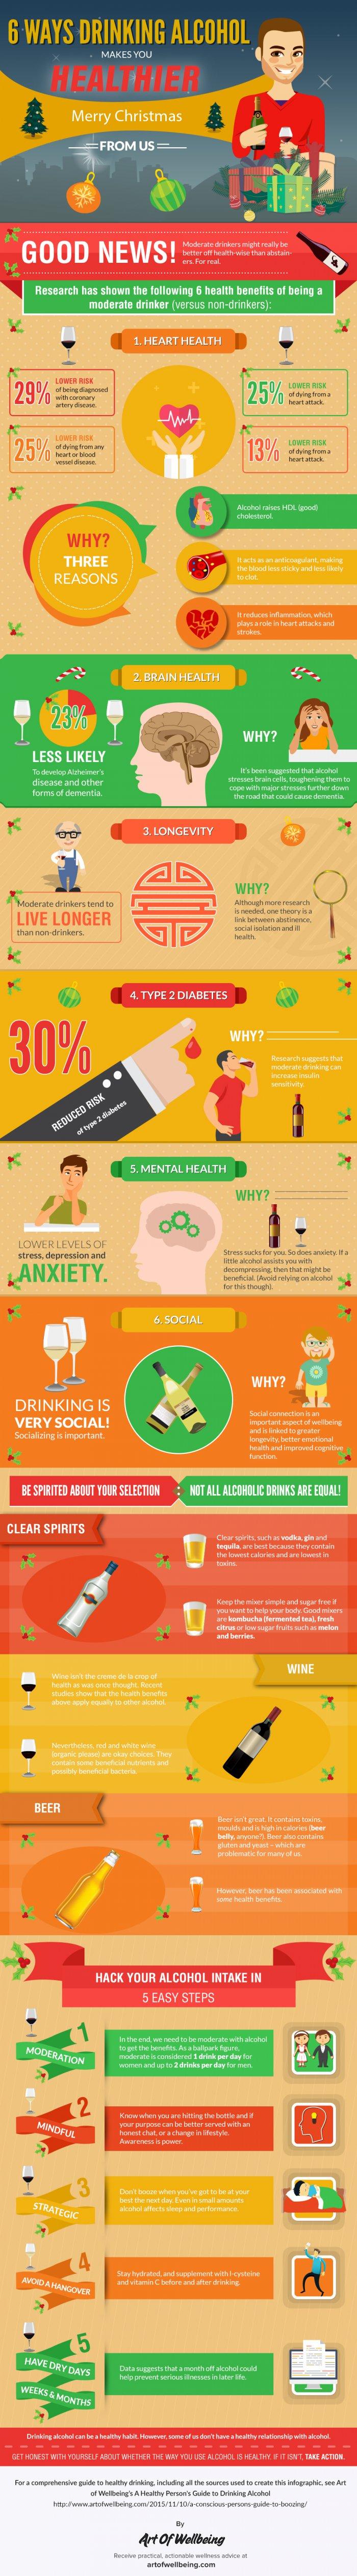 6-Ways-Drinking-Achohol-Makes-You-Healthier-New-500-kb